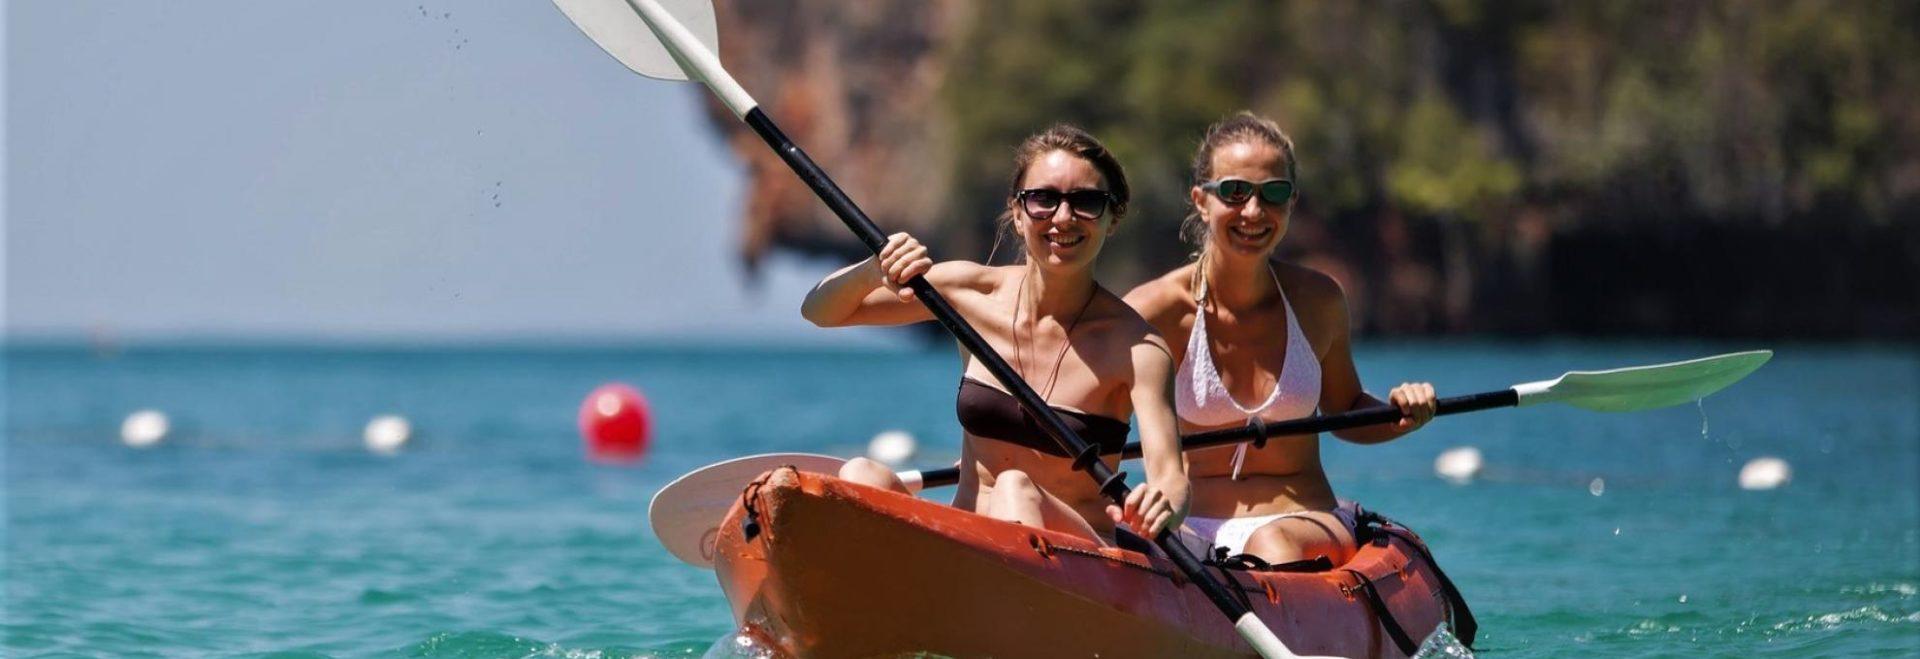 Canoa e kayak Giardini-Naxos